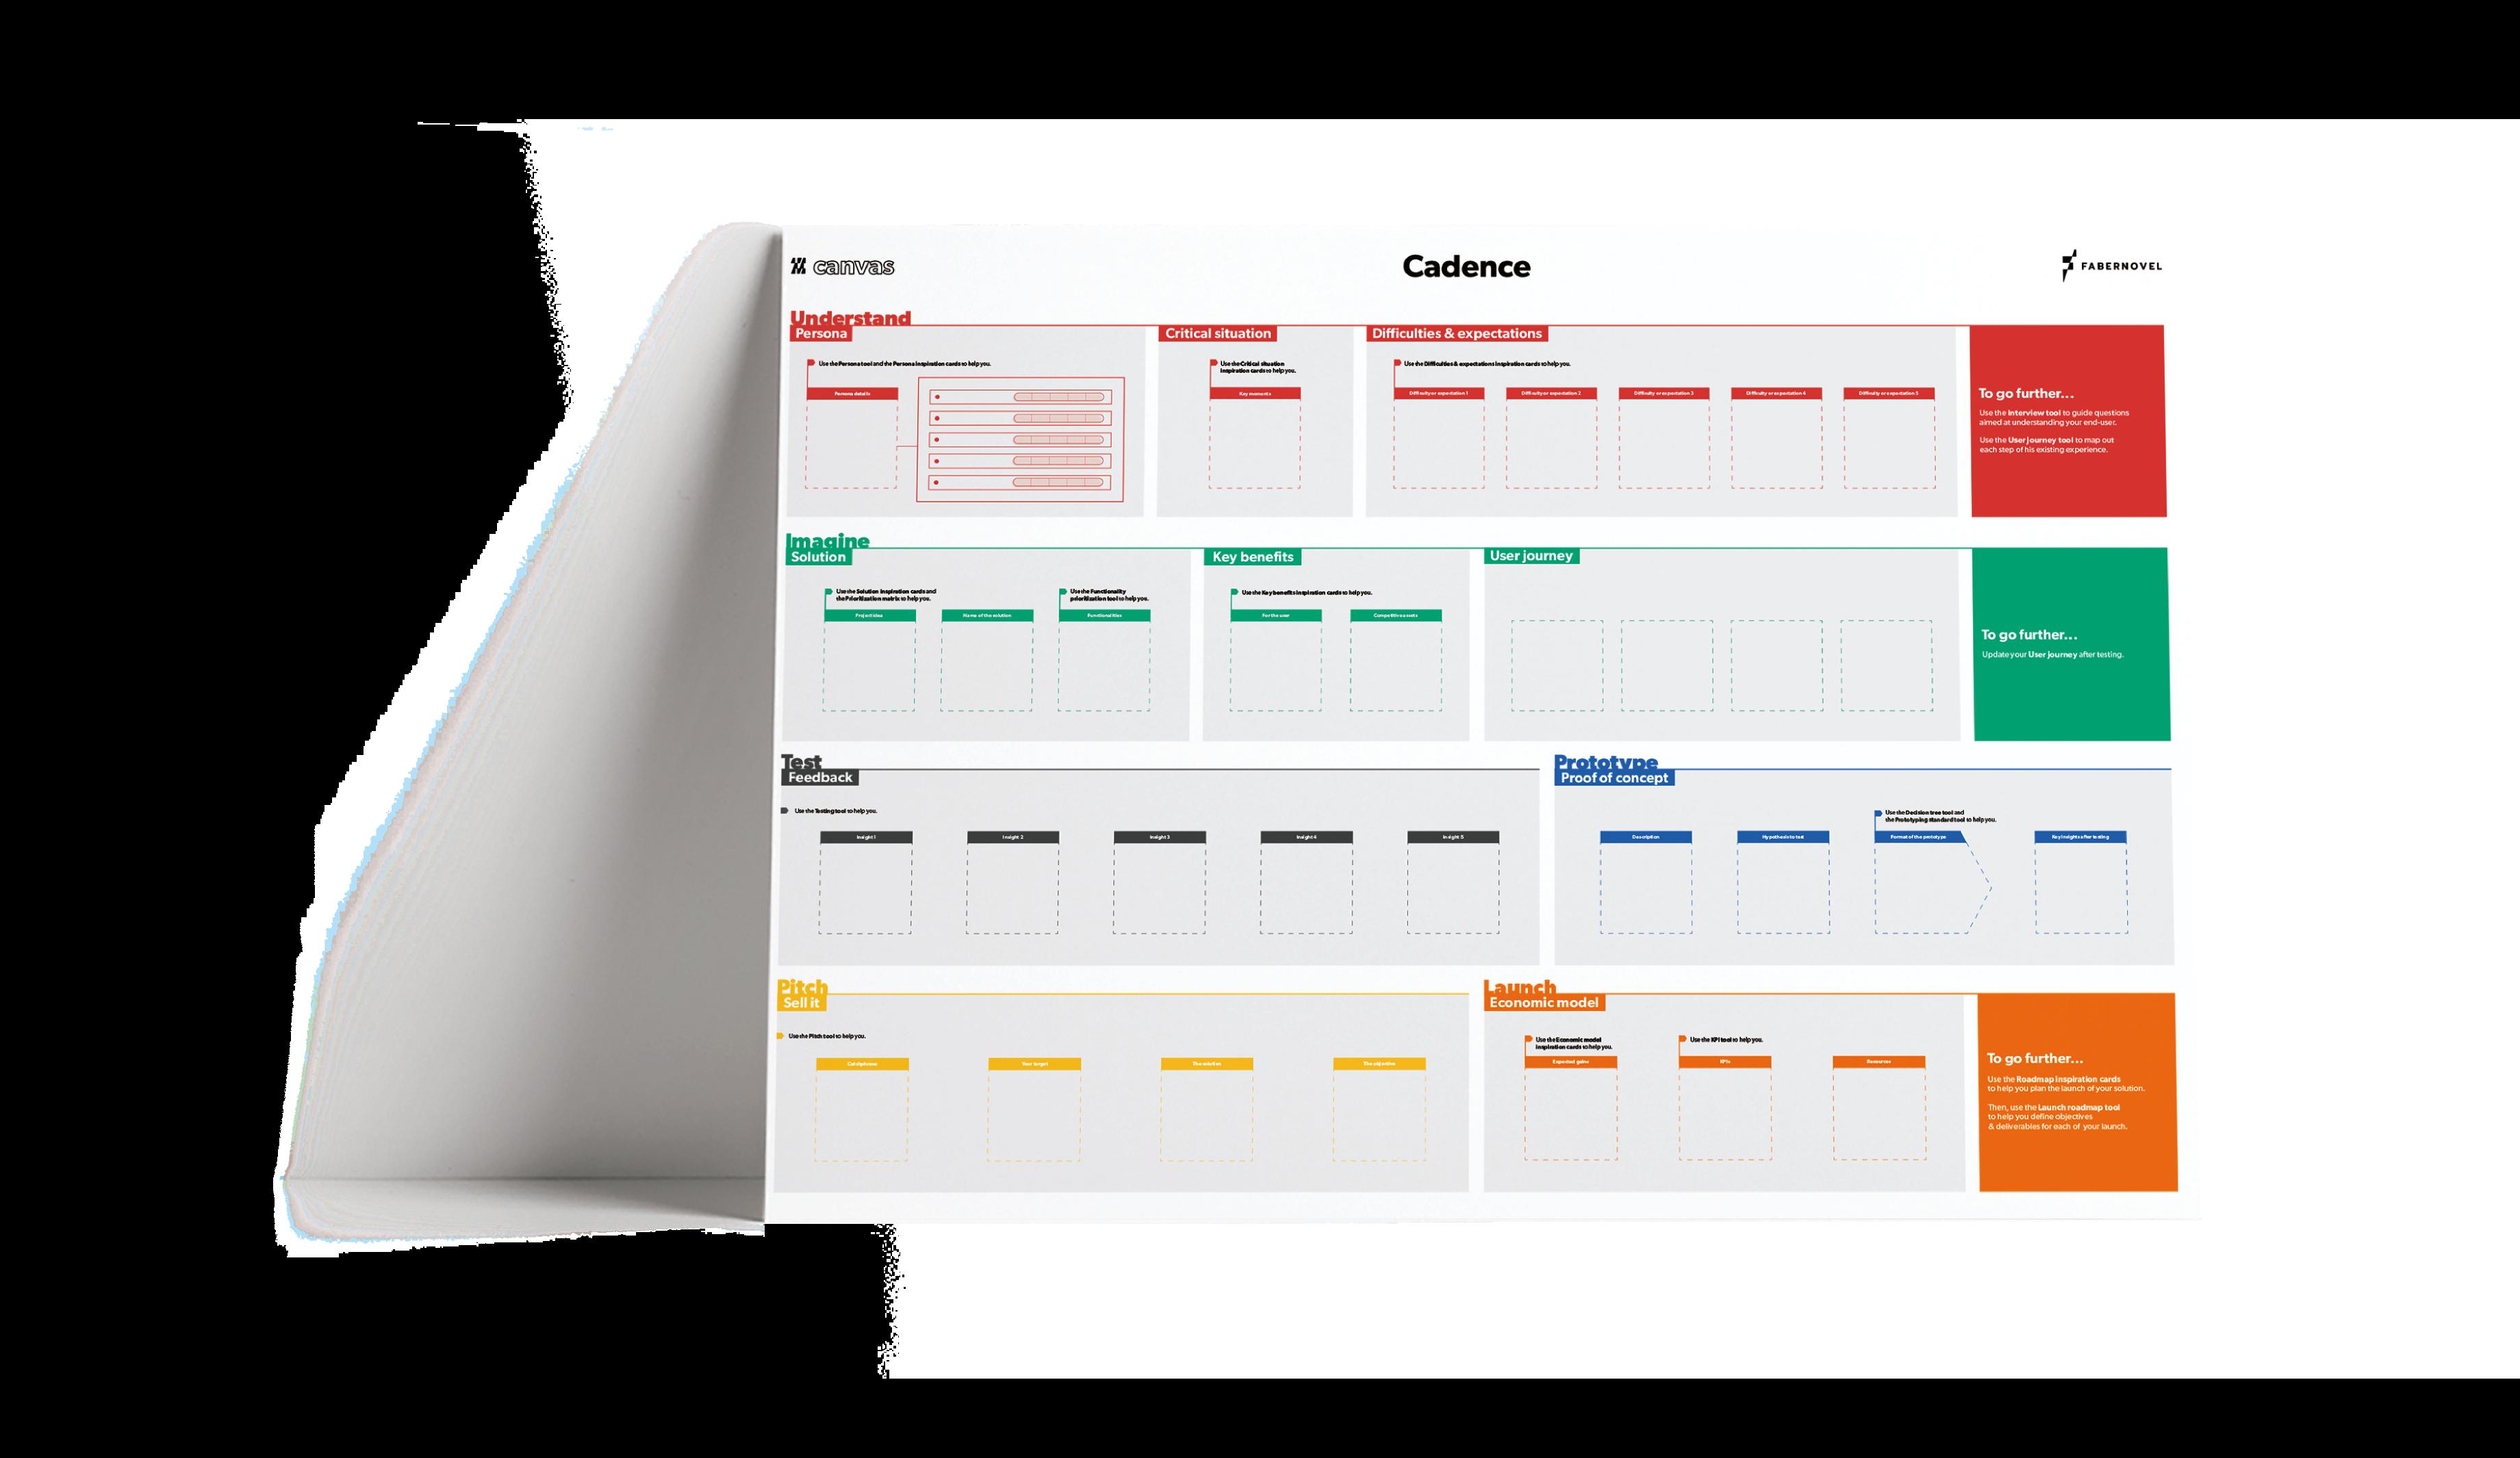 Cadence: Imagine a user-centric solution.